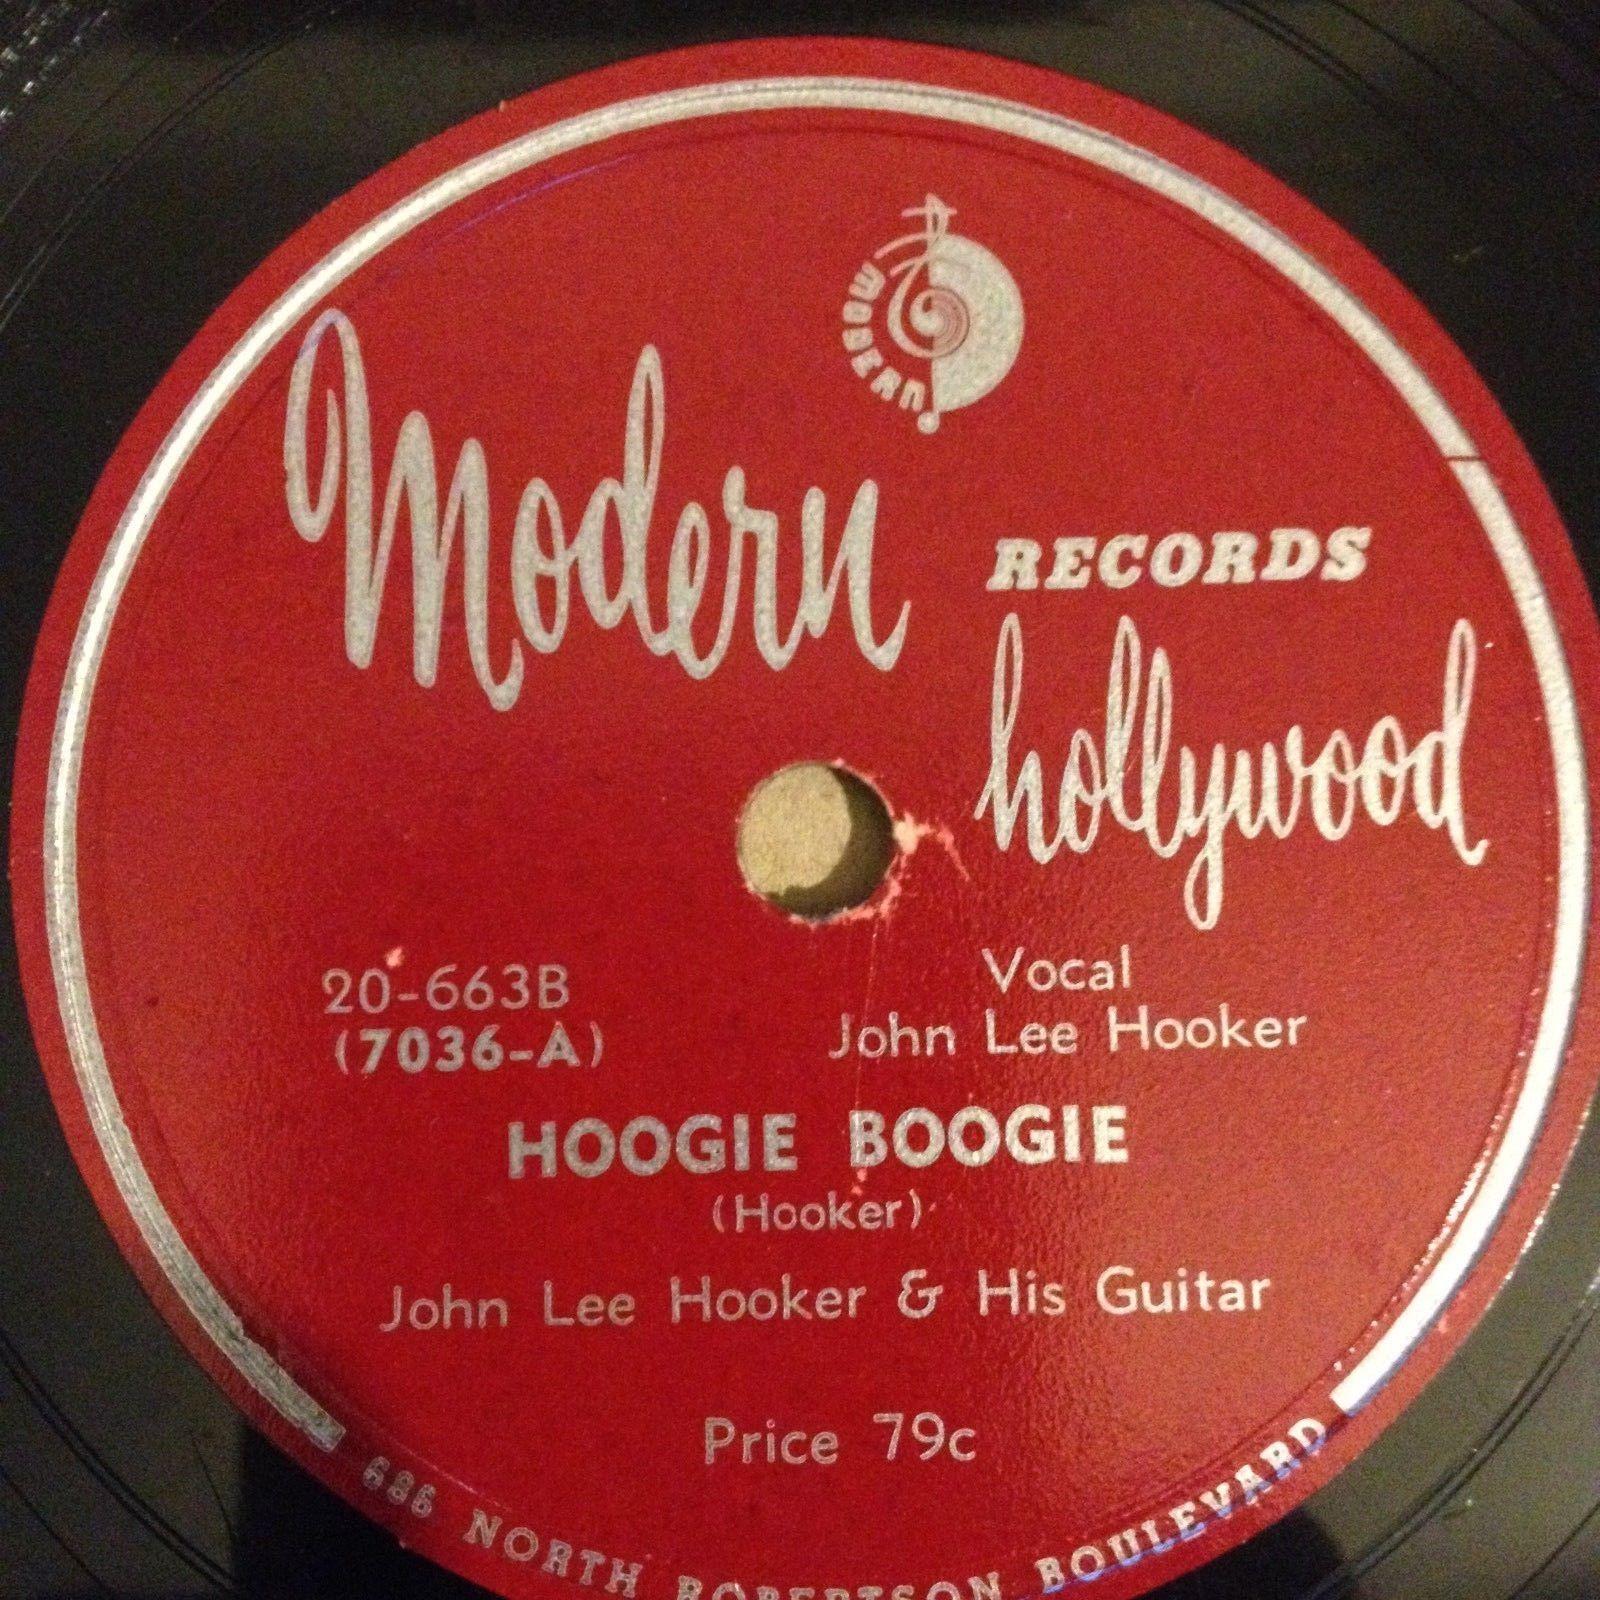 John Lee Hooker - Hoogie Boogie / Hobo Blues - Modern records 7036 -1949 -78 rpm